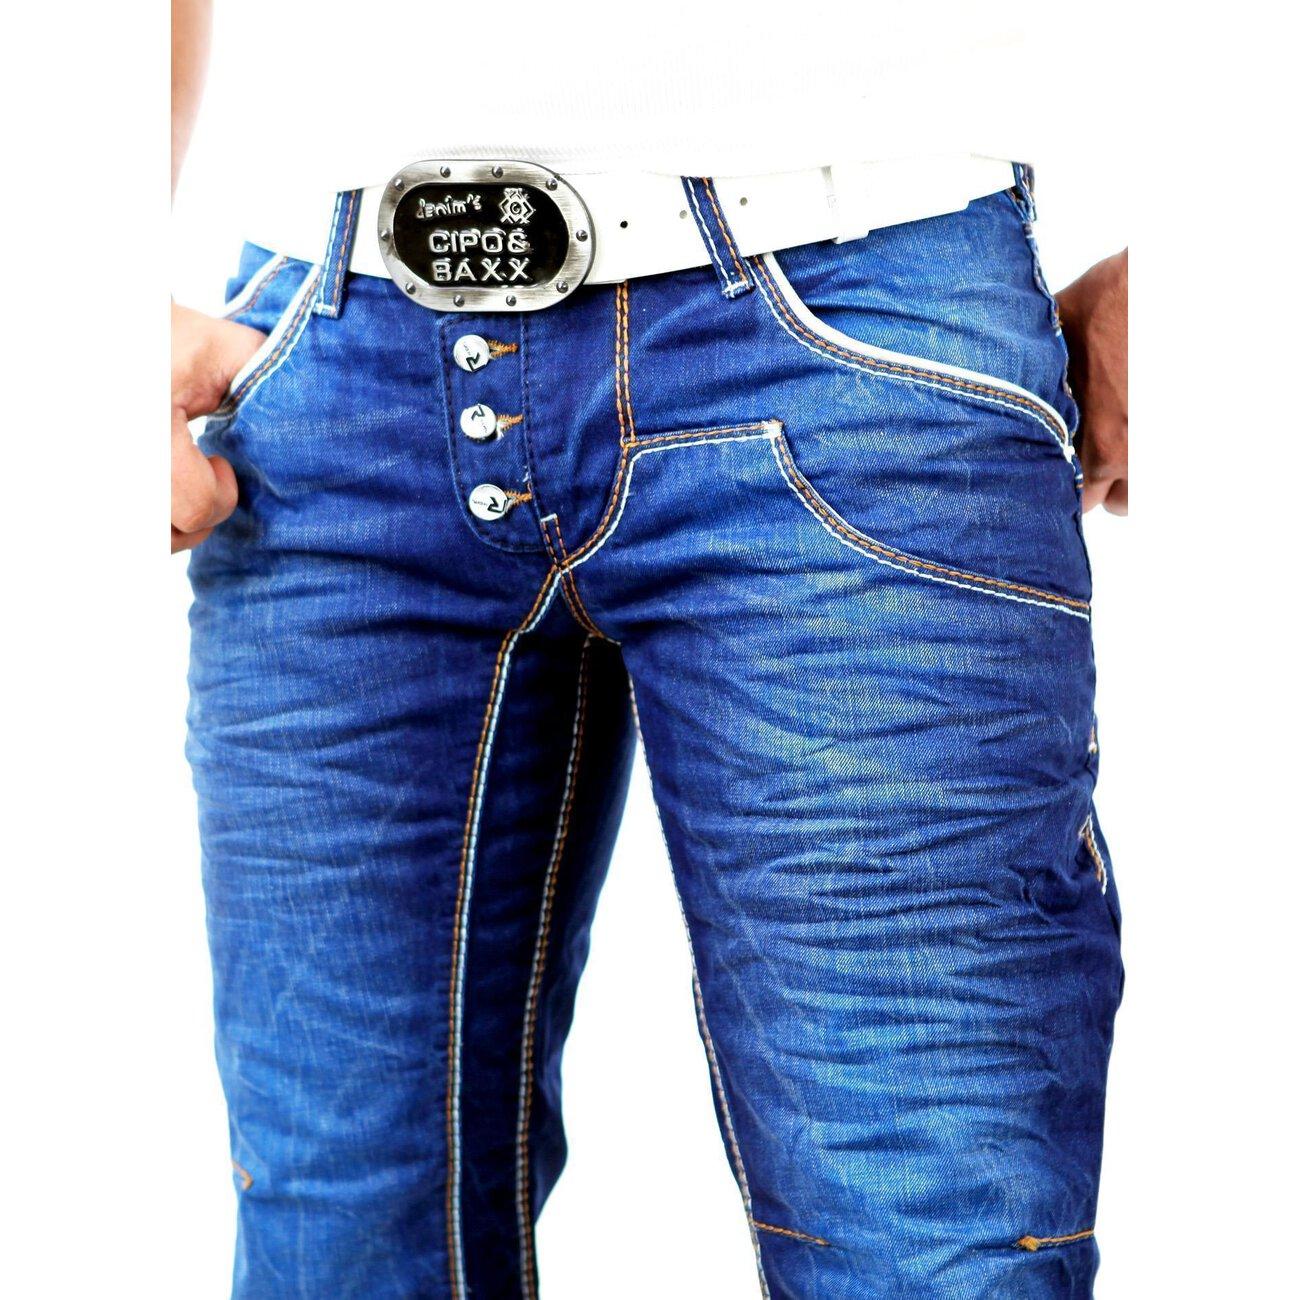 r neal herren used look dicke naht jeans hose rn 8442 25 blau w38 l34. Black Bedroom Furniture Sets. Home Design Ideas